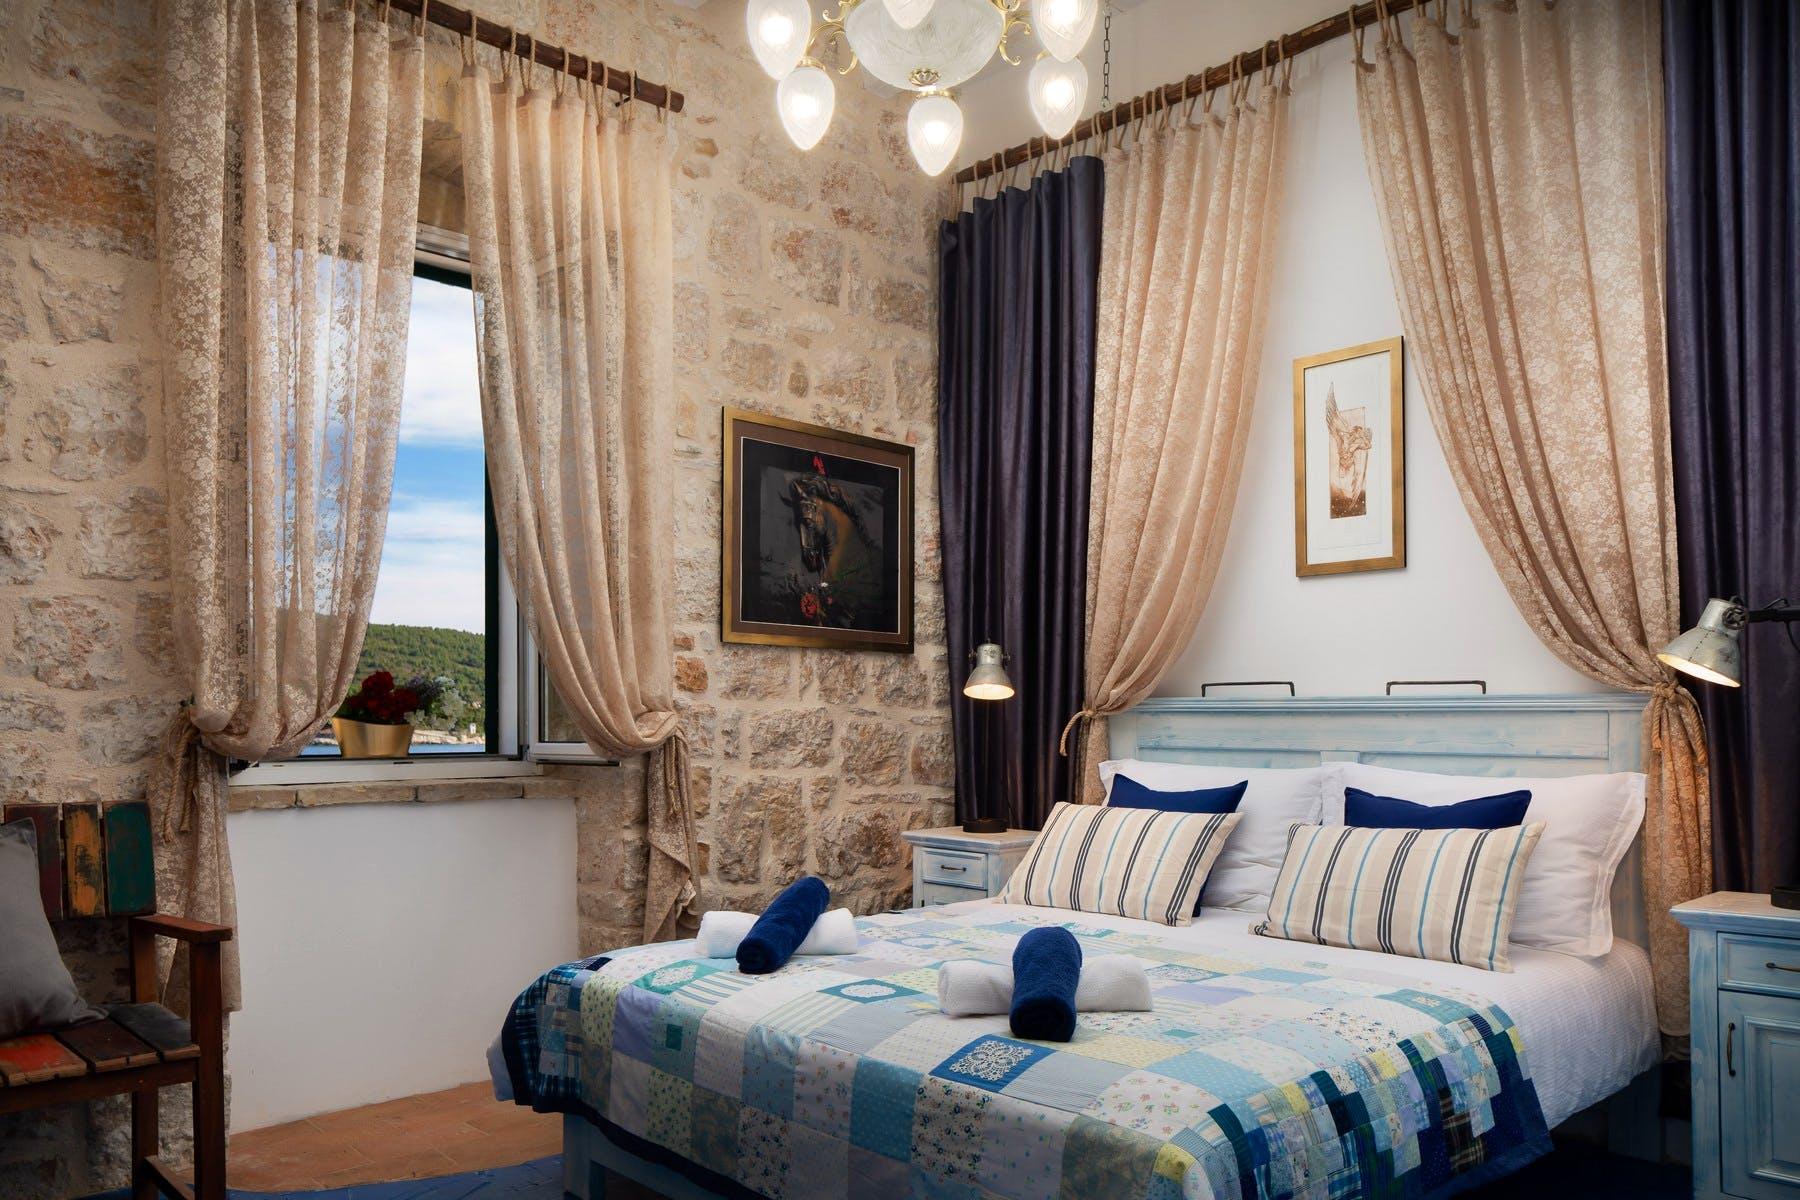 Rustic style double bedroom